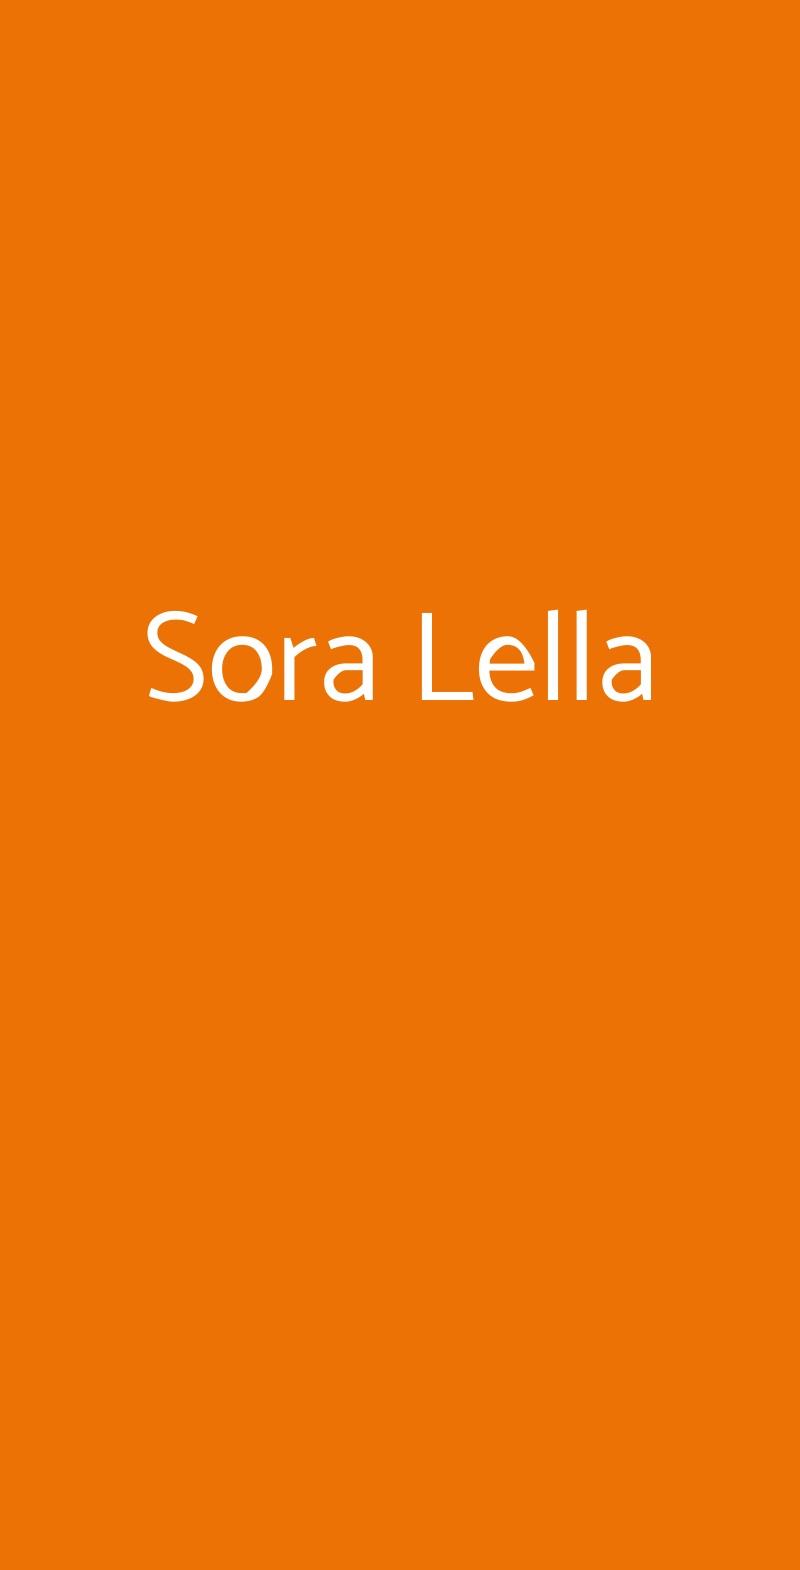 Sora Lella Roma menù 1 pagina